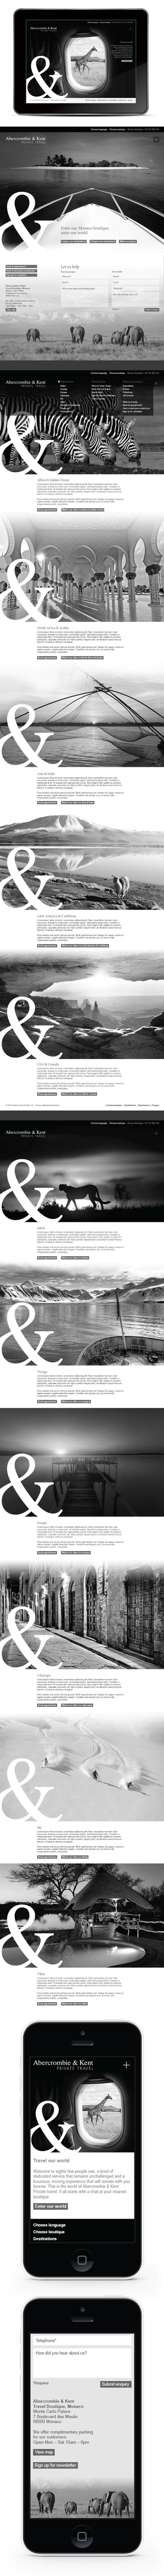 Abercrombie & Kent luxury travel website by Julie Nicholls, via Behance